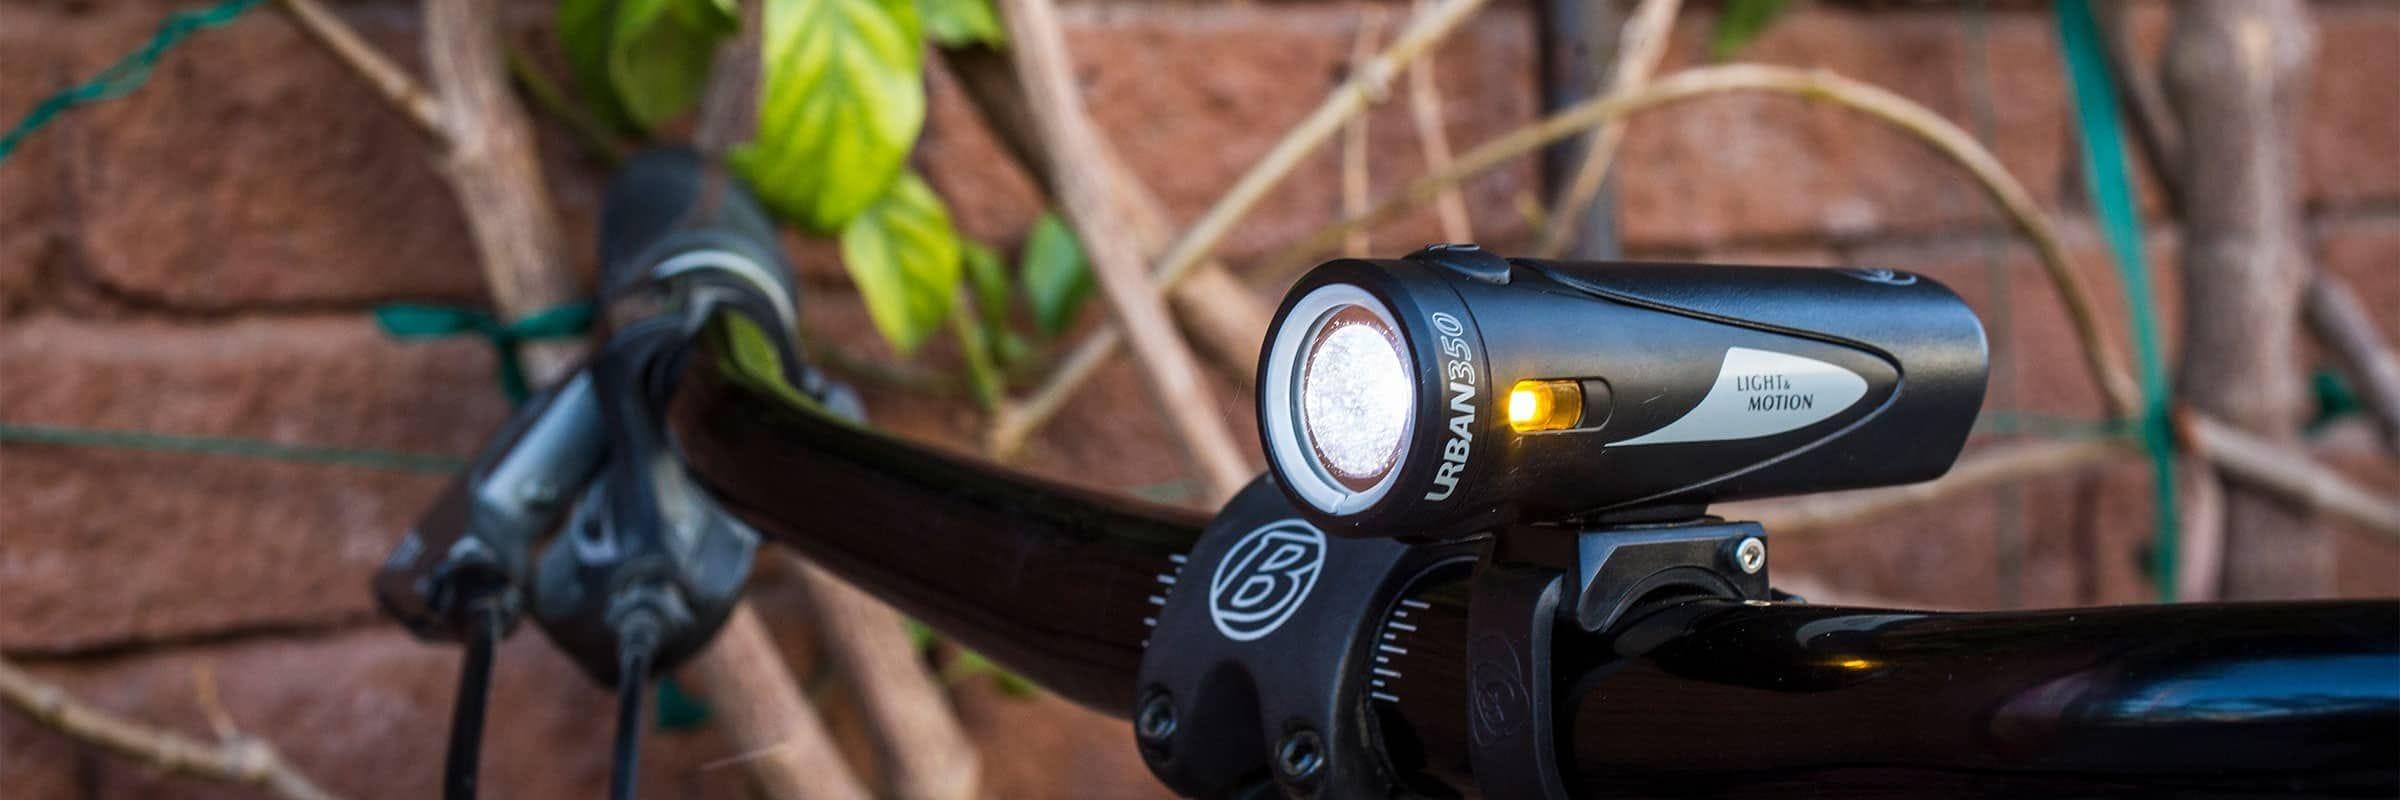 Biking & Cycling, Lezyne, Light & Motion. Top 5 Cycling Lights for Biking at Night